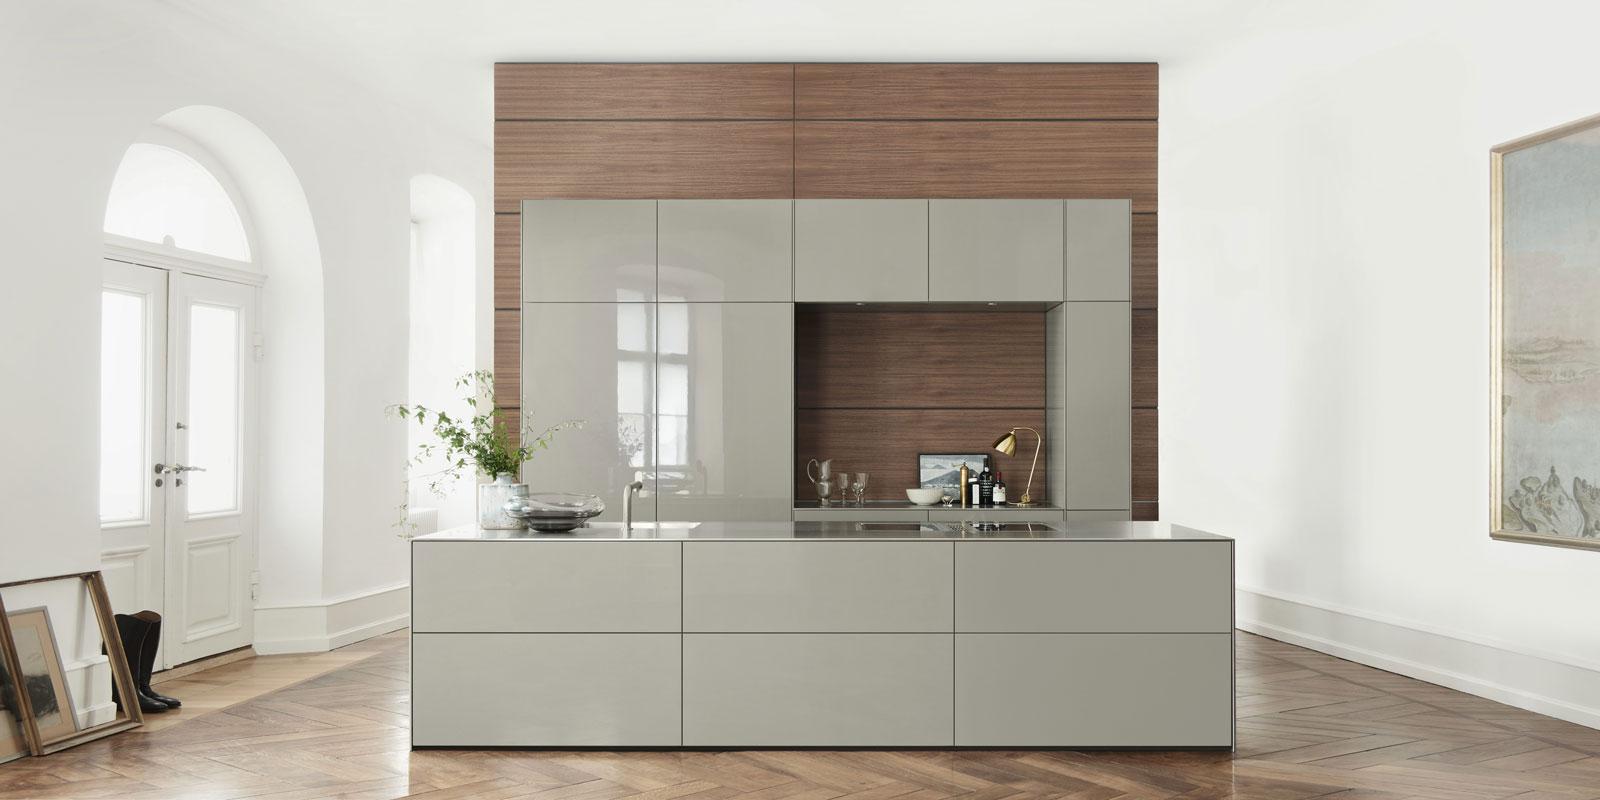 bulthaup stadshaege. Black Bedroom Furniture Sets. Home Design Ideas